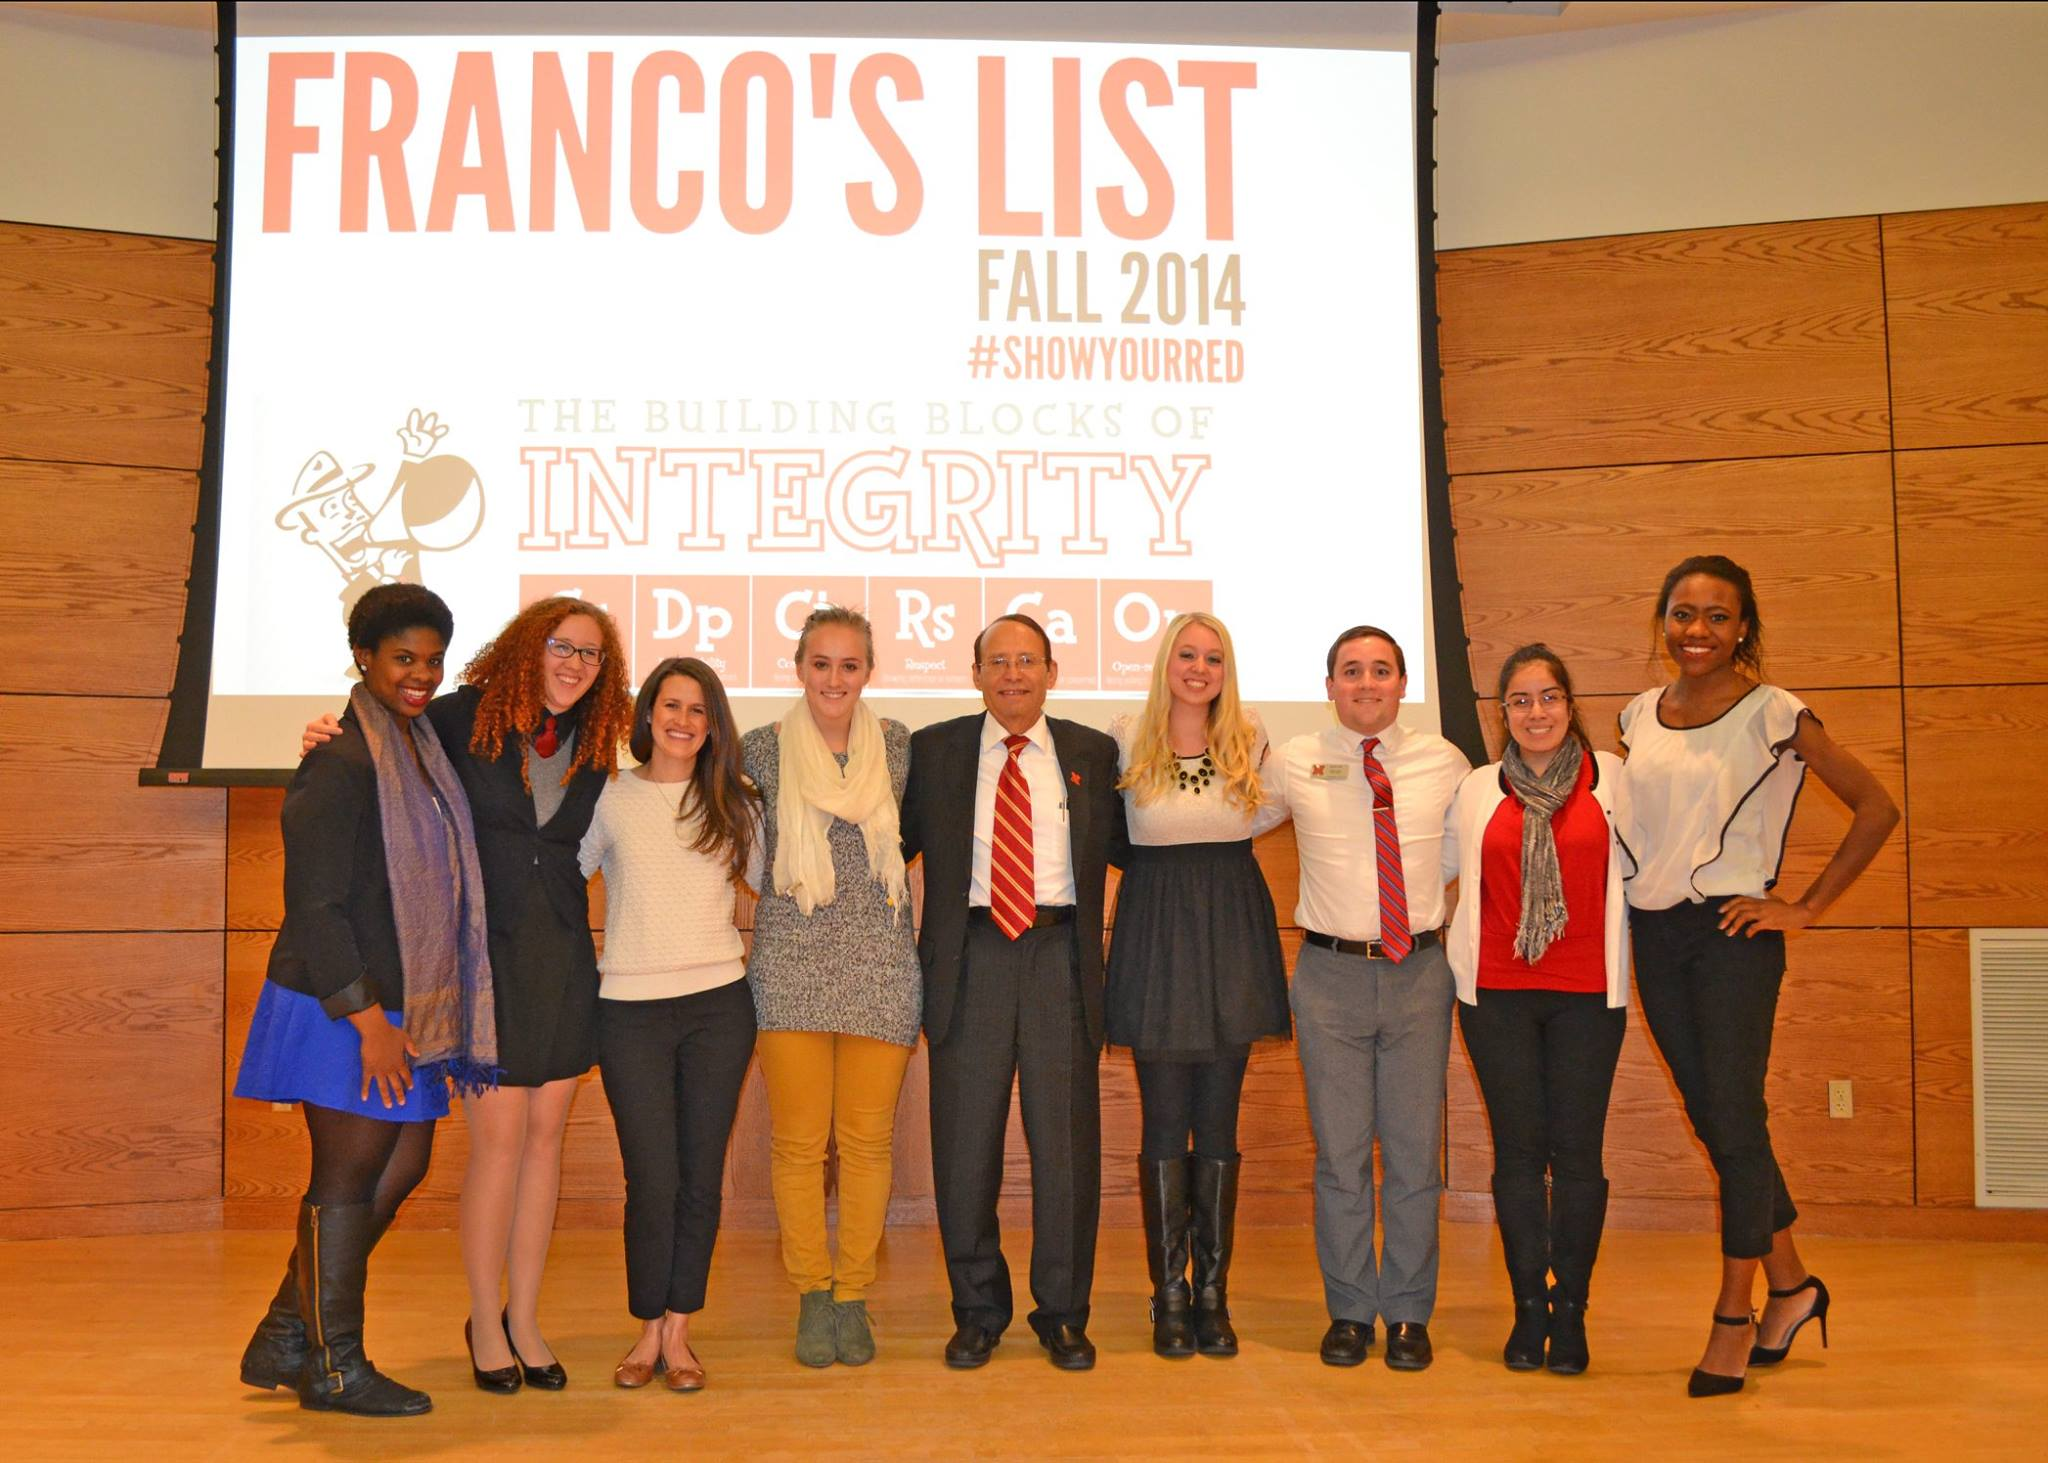 Franco's List 2014